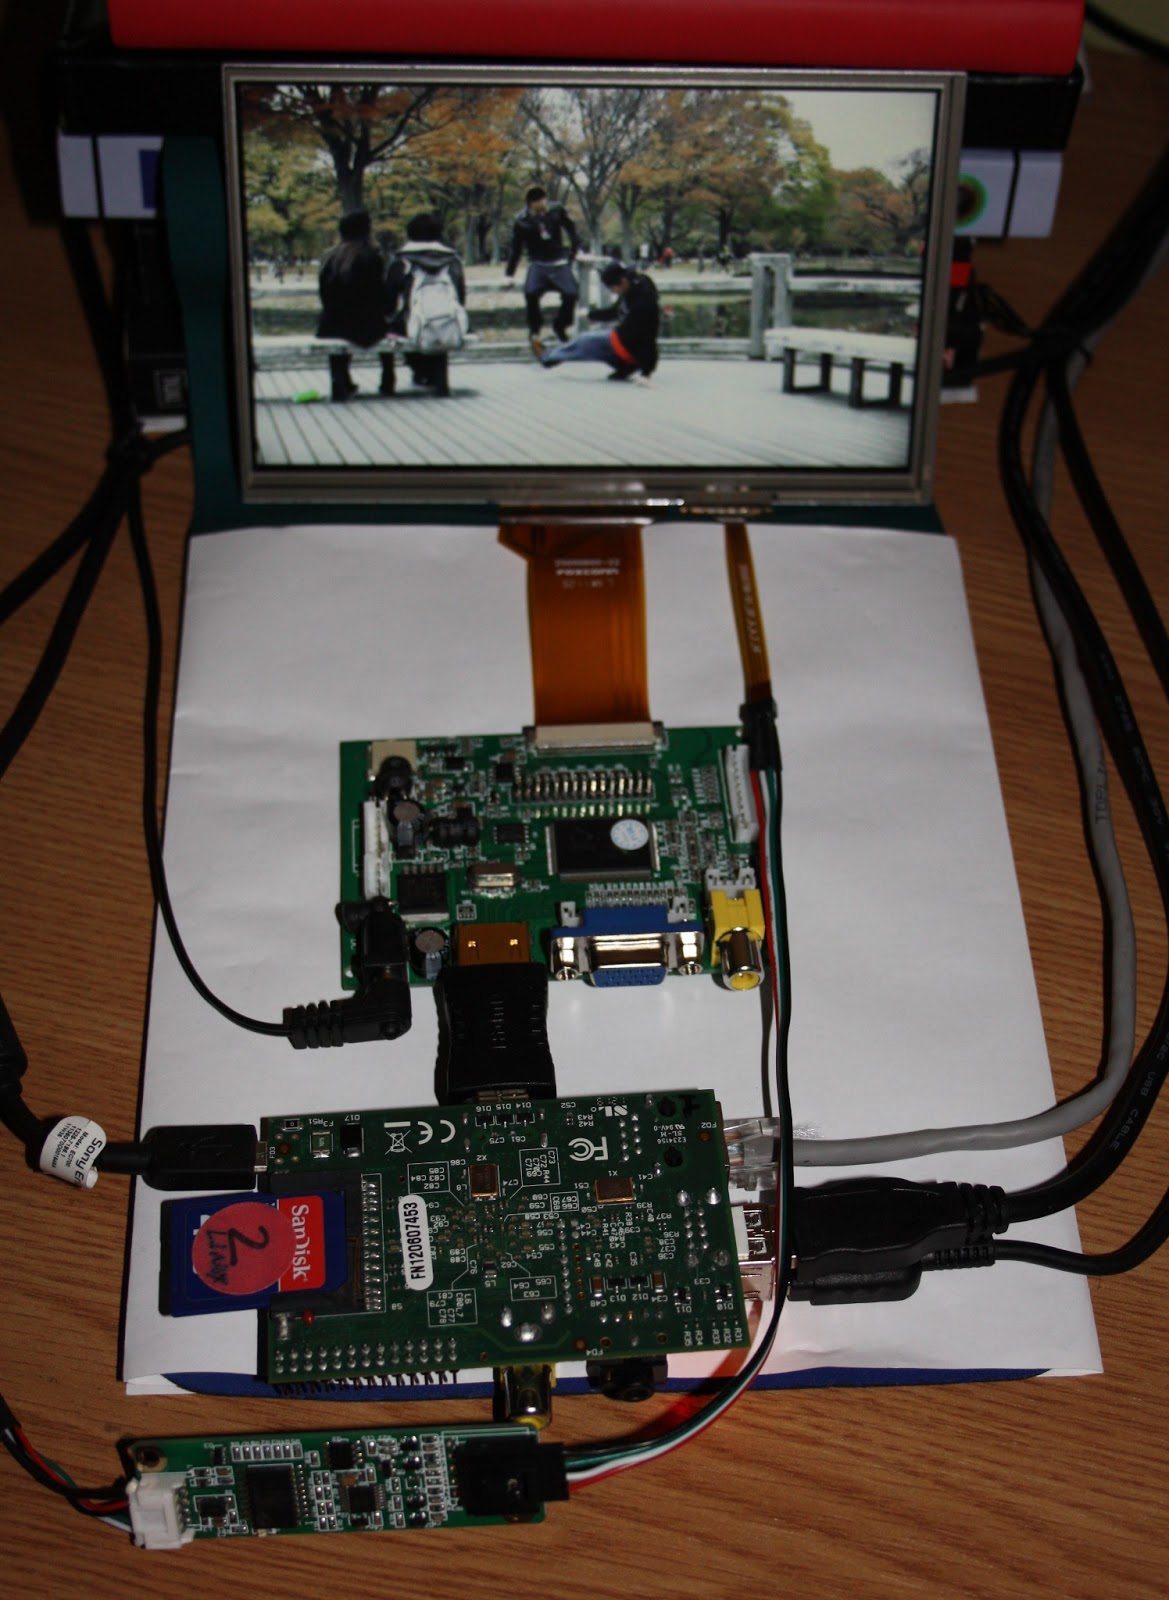 Xbmc raspberry pi 2 image download